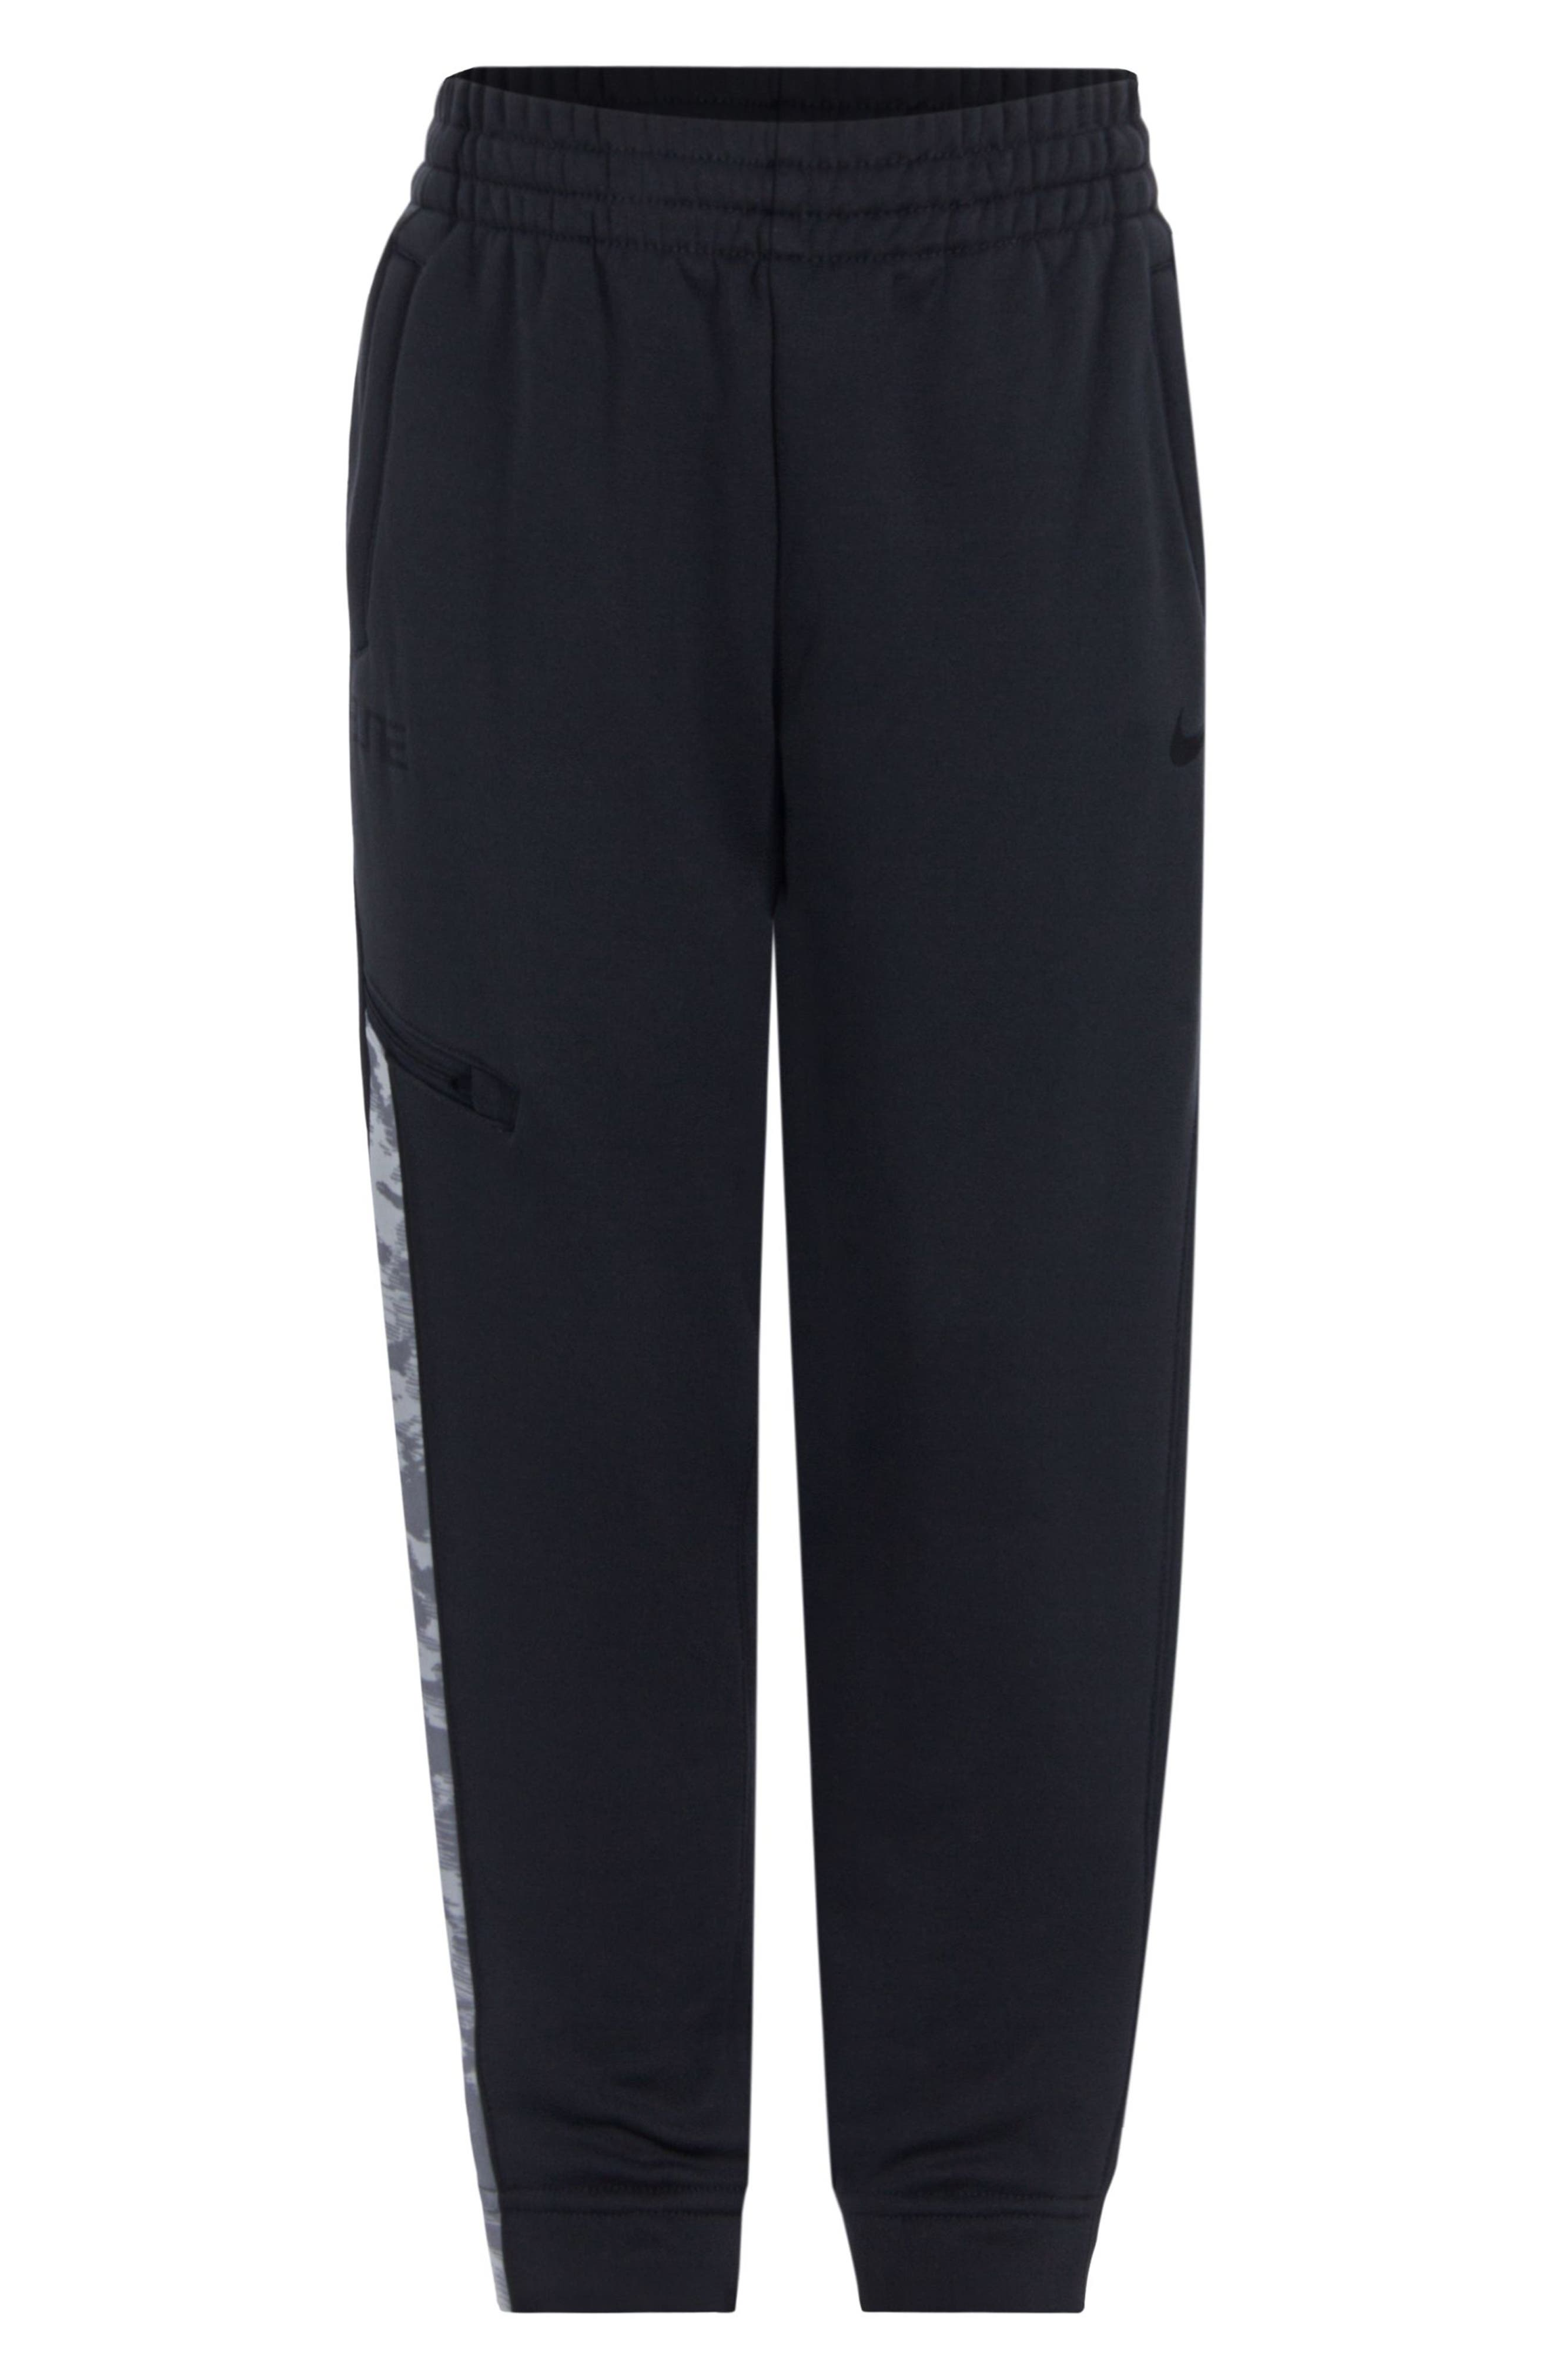 Therma Elite Pants,                             Alternate thumbnail 2, color,                             004